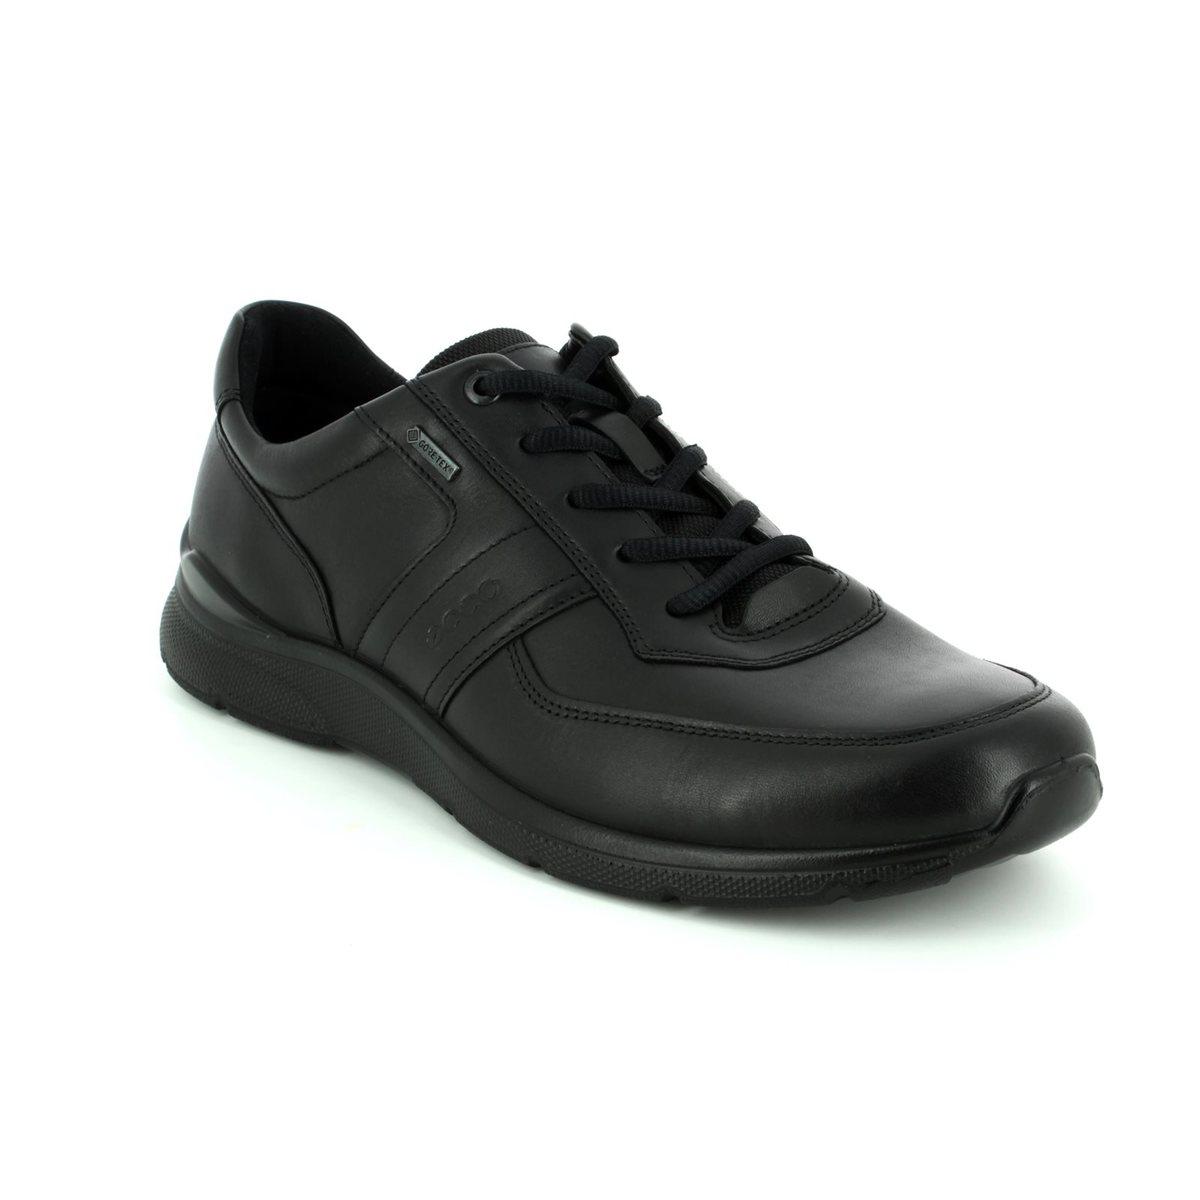 Nike Mens Casual Dress Shoes